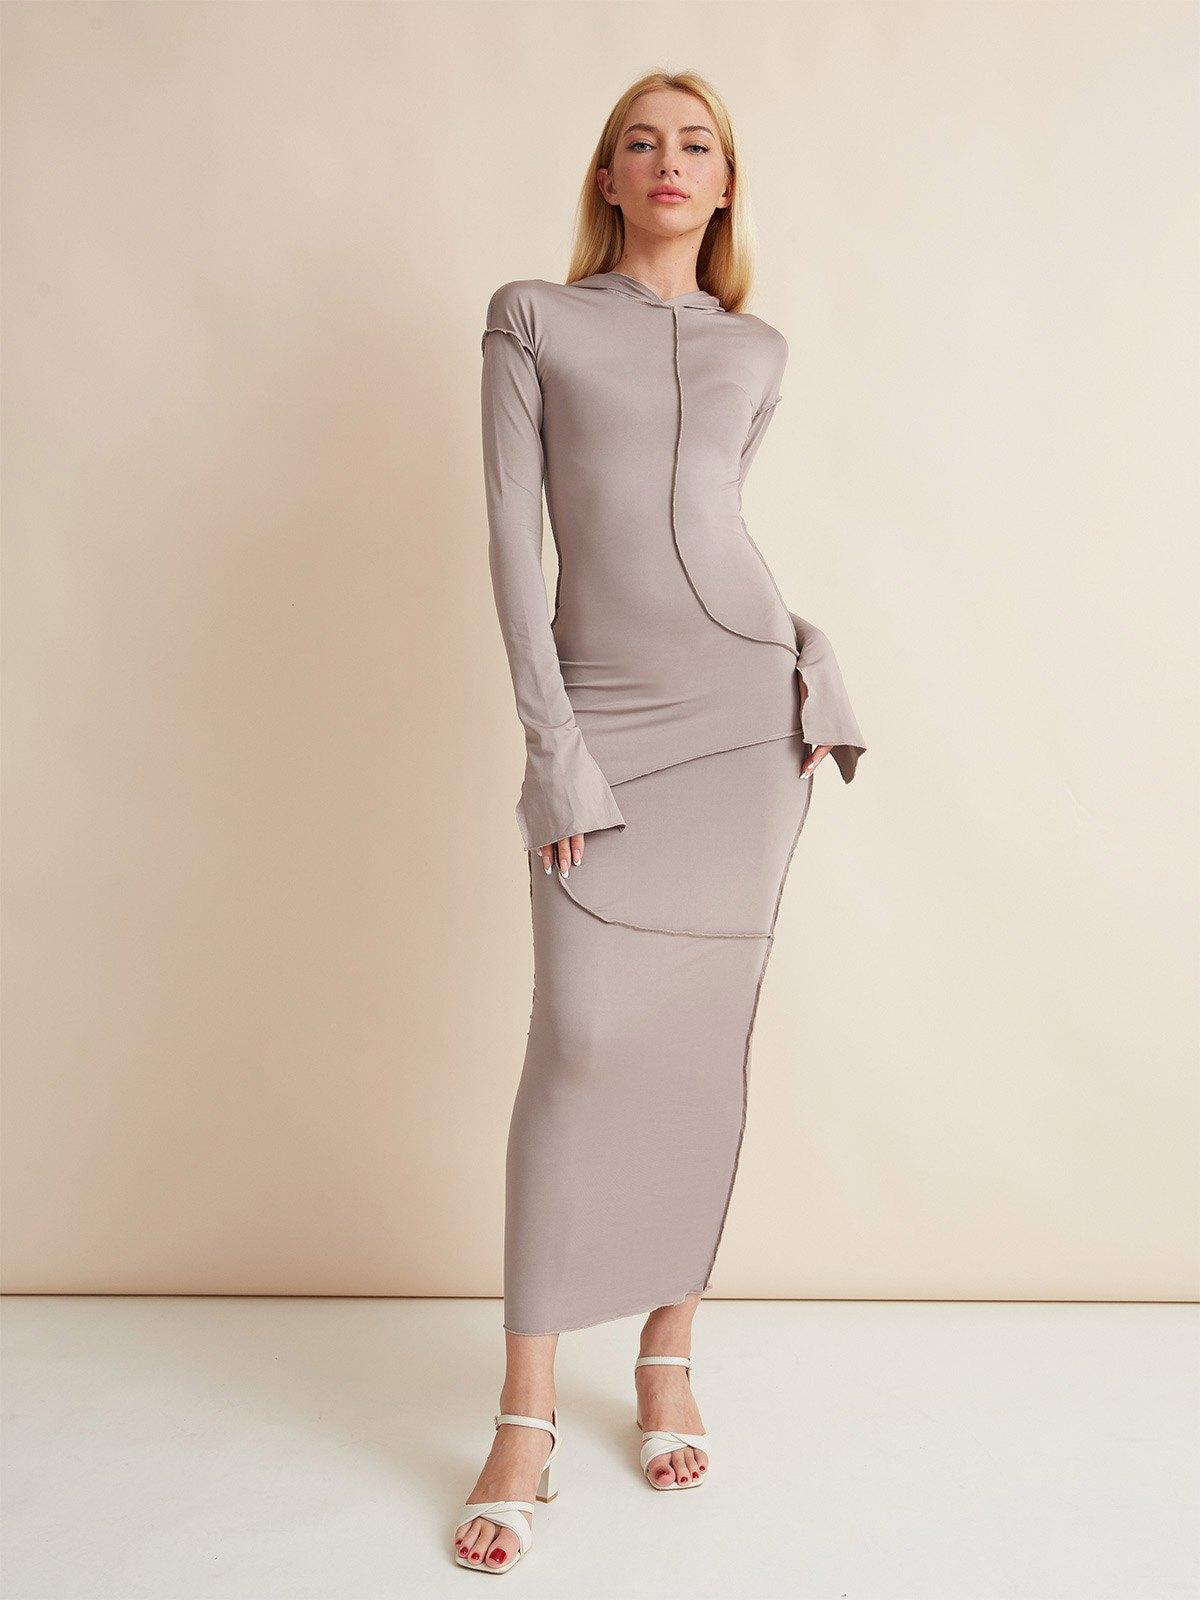 Seam Detail Hooded Maxi Dress - Brown S